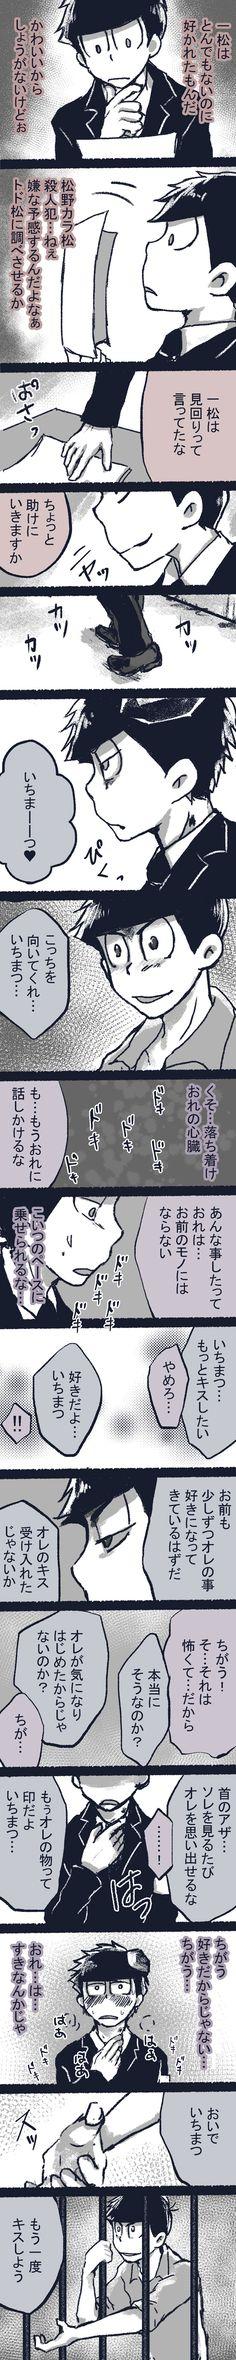 pixiv(ピクシブ)は、作品の投稿・閲覧が楽しめる「イラストコミュニケーションサービス」です。幅広いジャンルの作品が投稿され、ユーザー発の企画やメーカー公認のコンテストが開催されています。 Osomatsu San Doujinshi, Ichimatsu, Anime Stuff, Comic, Comic Strips, Comics, Cartoon, Comics And Cartoons